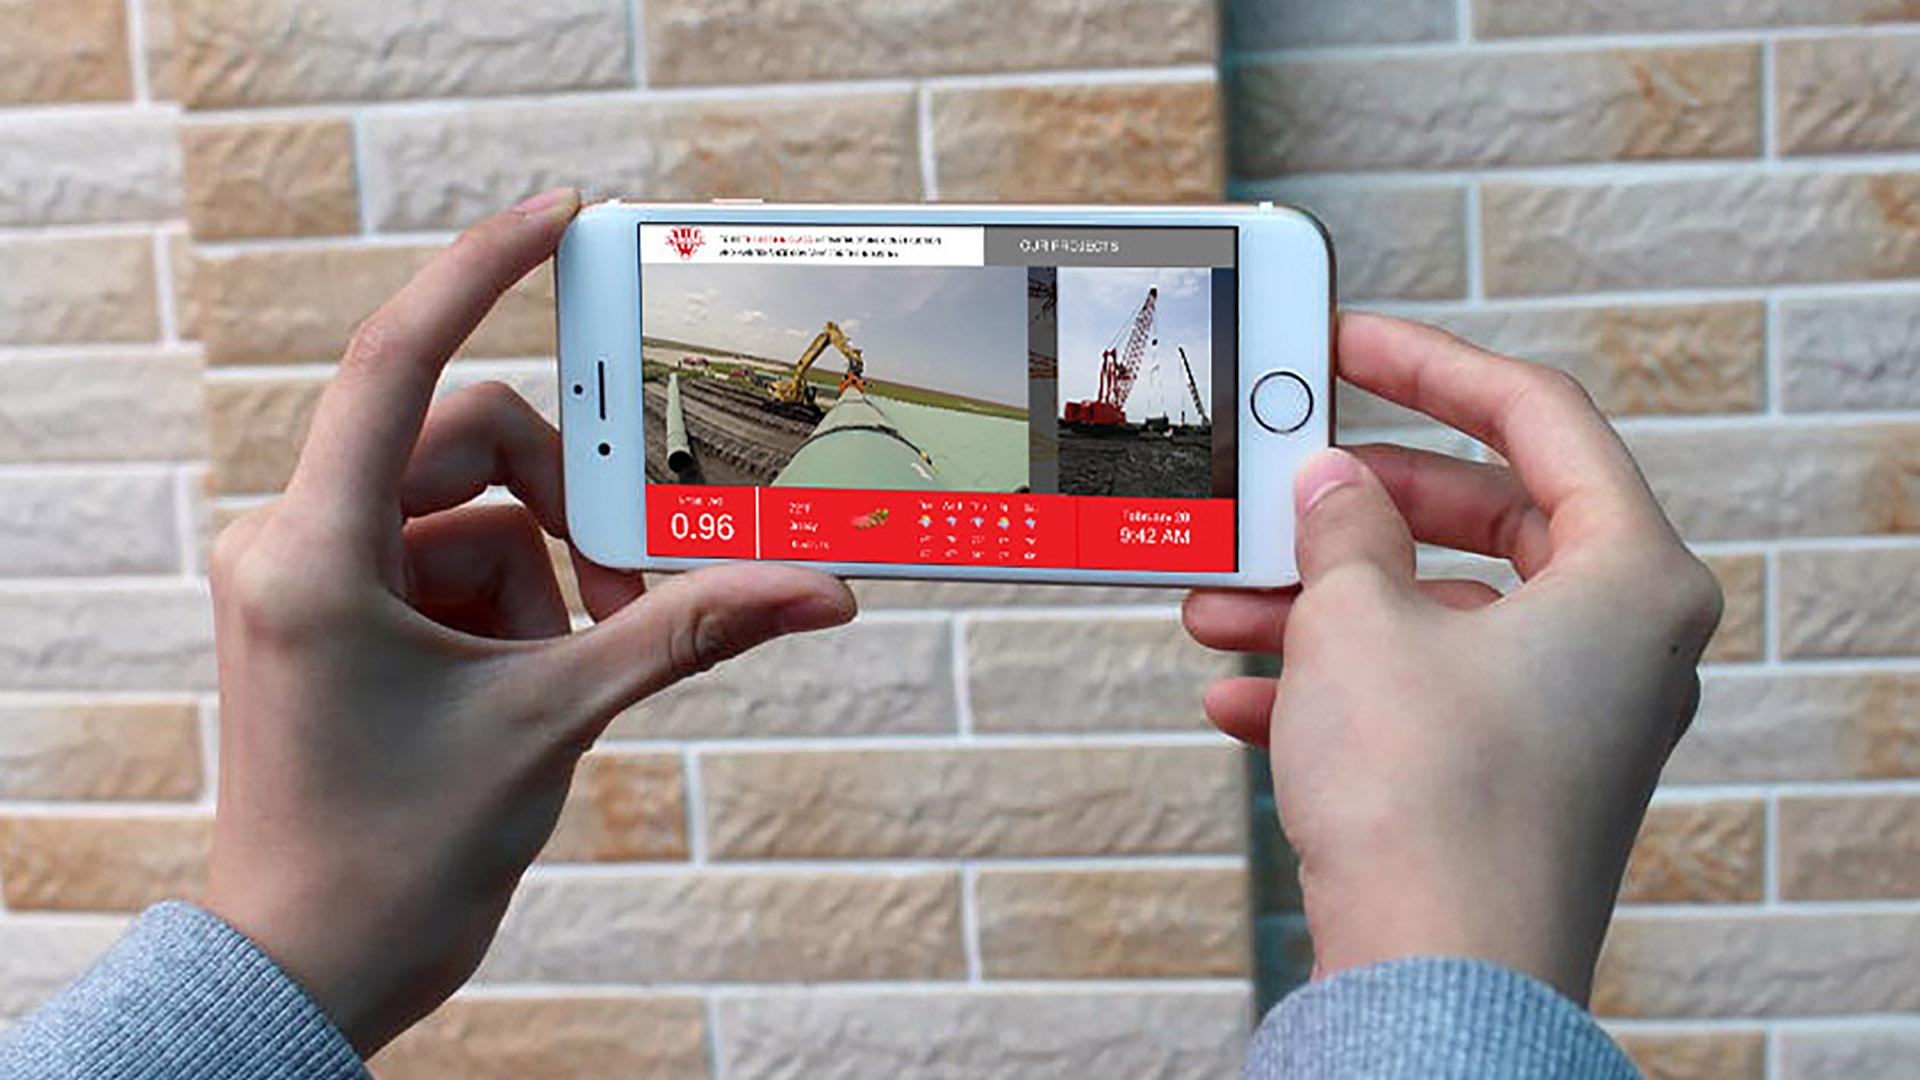 Digital Signage viewing on phones